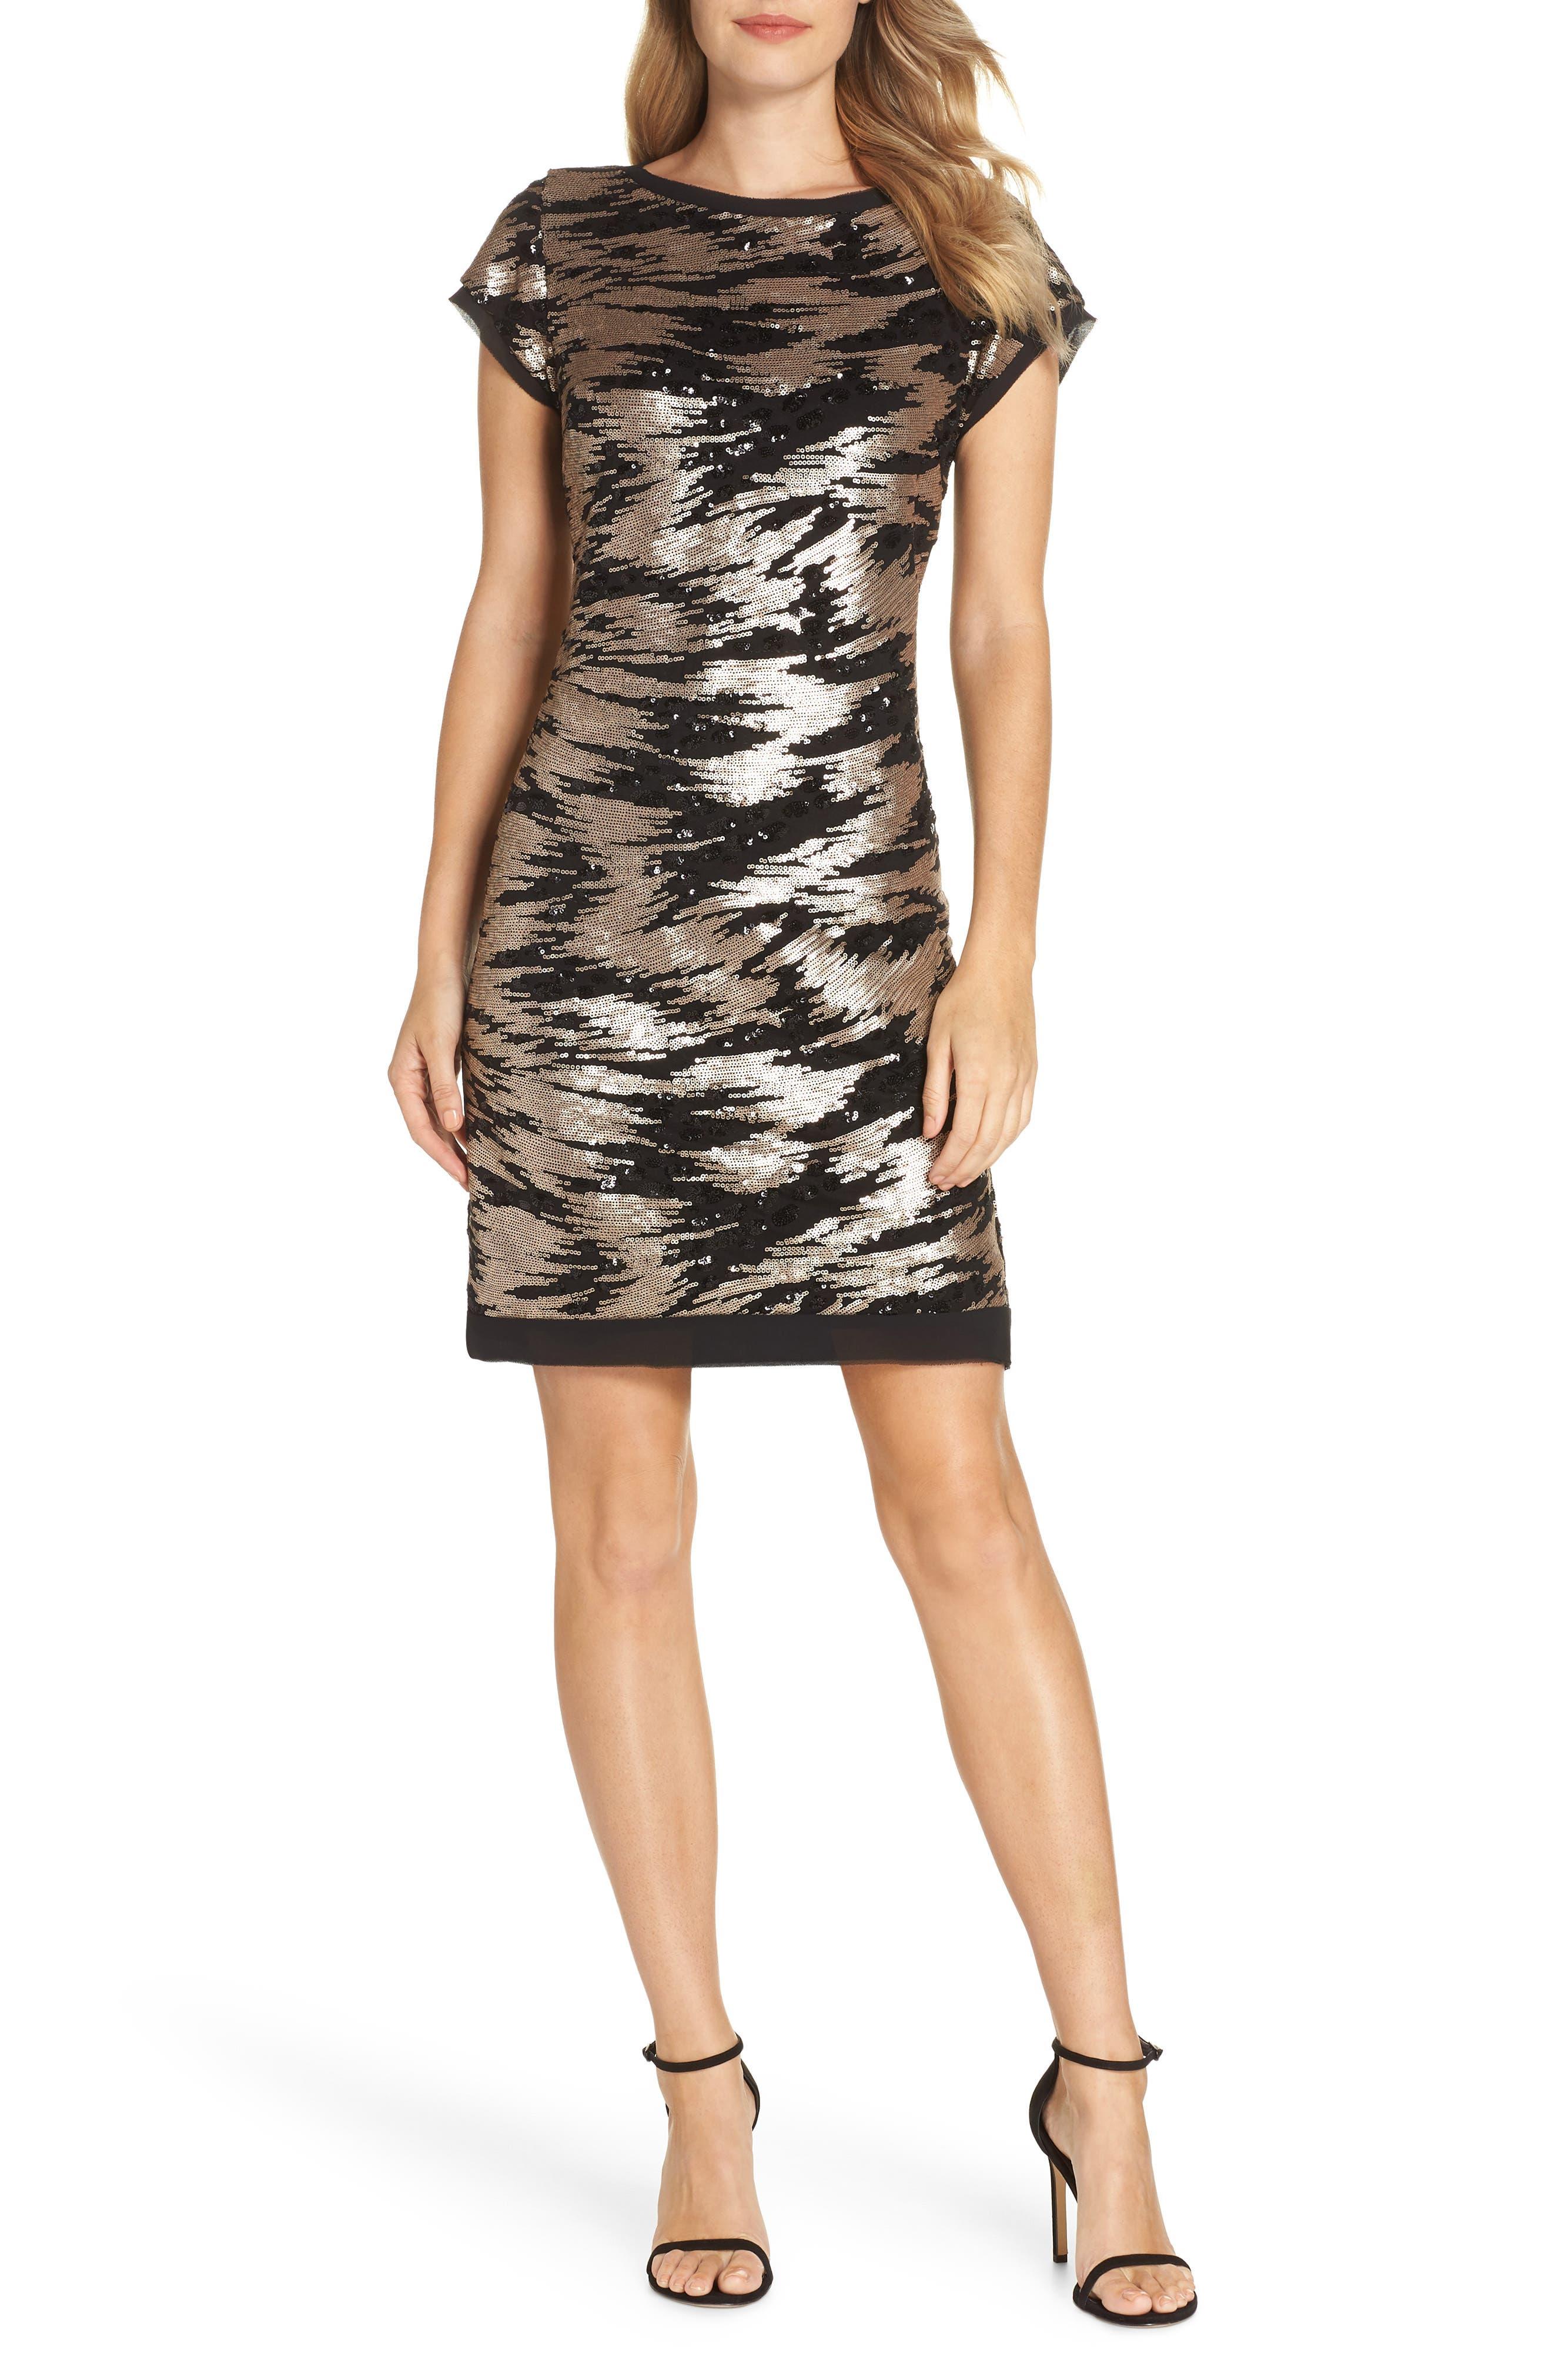 ELIZA J Sequin Sheath Dress, Main, color, BLACK/ GOLD